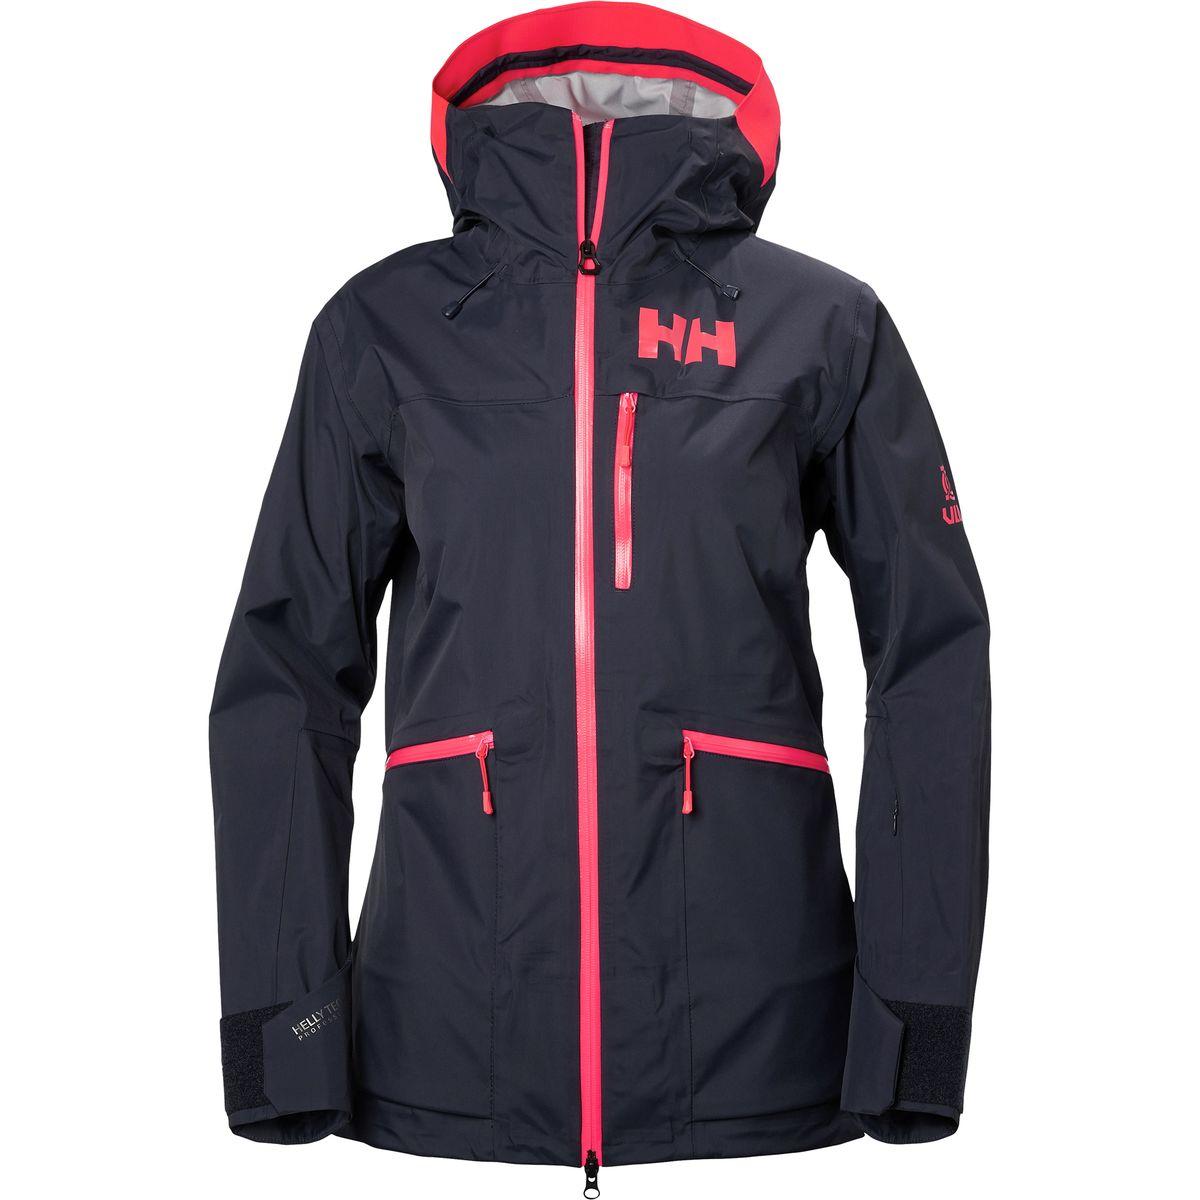 Helly Hansen Kvitegga Shell Jacket - Women